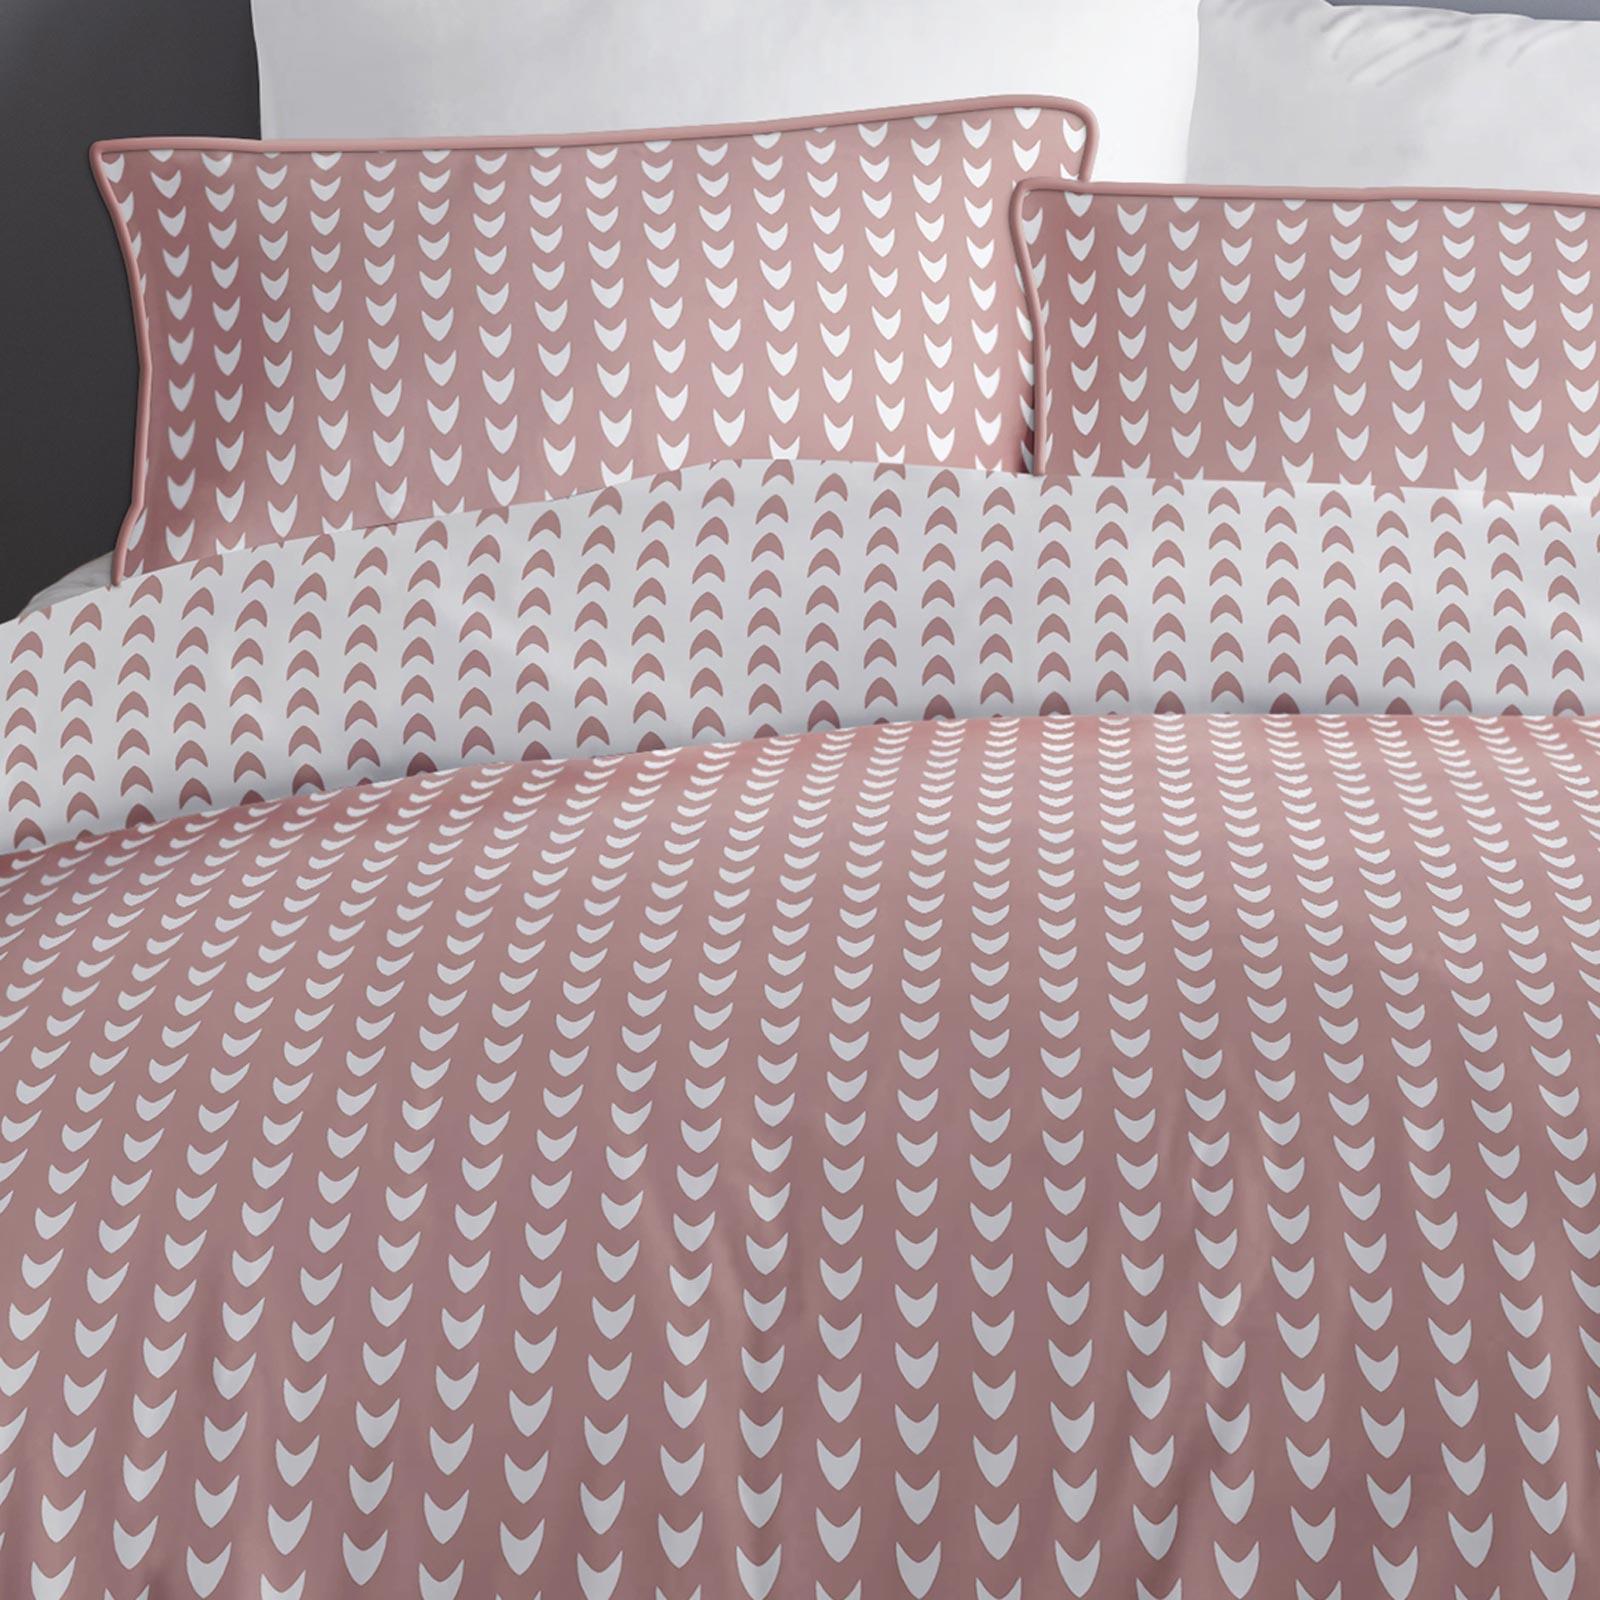 Blush-fundas-nordicas-Rosa-Geometrico-100-Algodon-Edredon-Reversible-conjuntos-de-cama miniatura 4